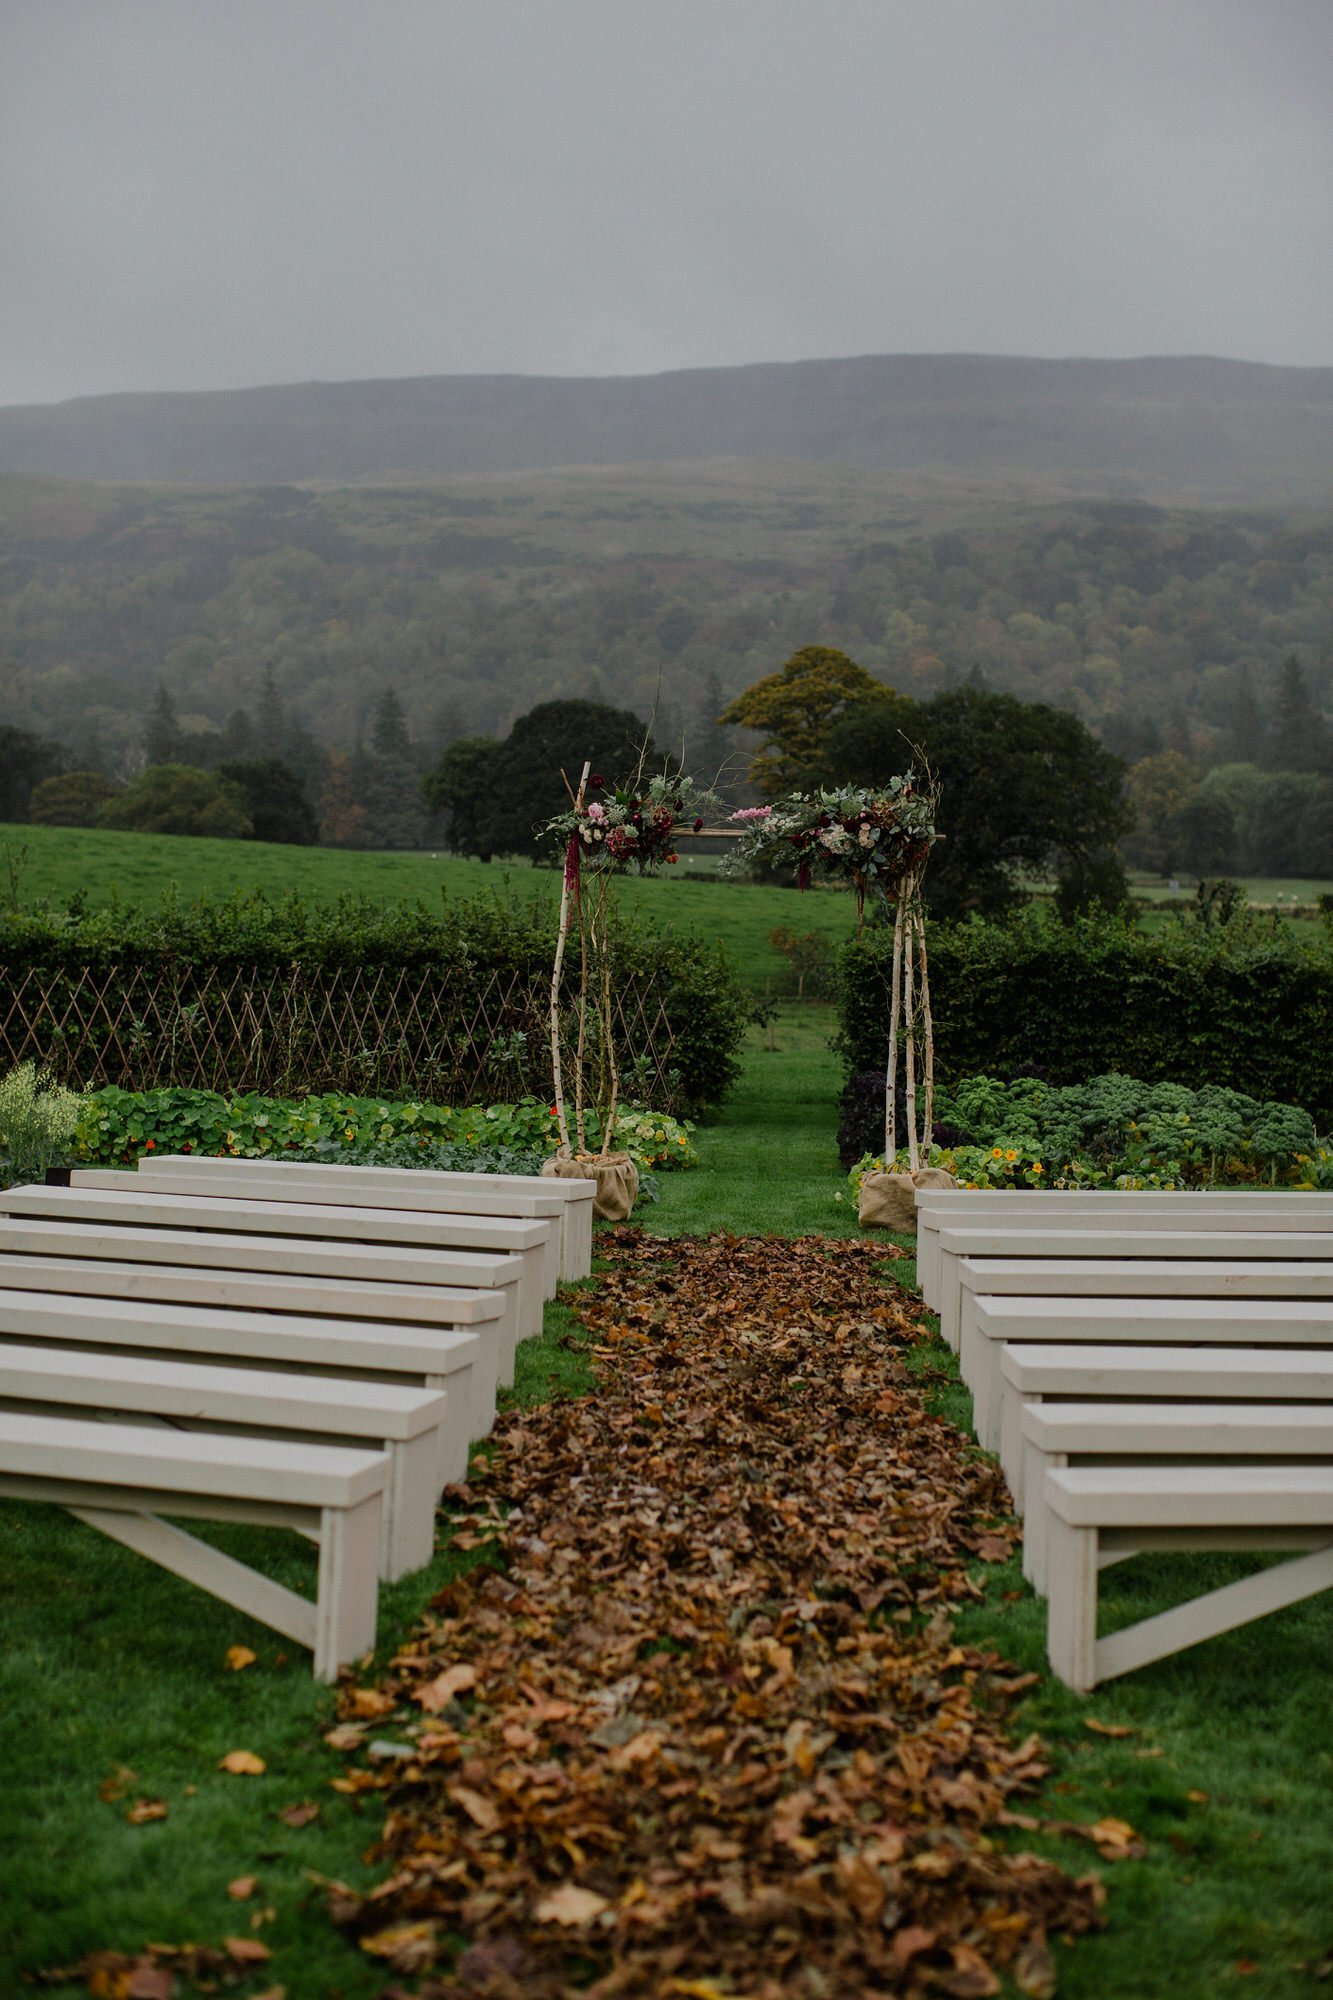 015 TIN SHED KNOCKRAICH FARM WEDDING OUTDOOR CEREMONY FLORAL ARCH BRIDE ZOE ALEXANDRA PHOTOGRAPHY